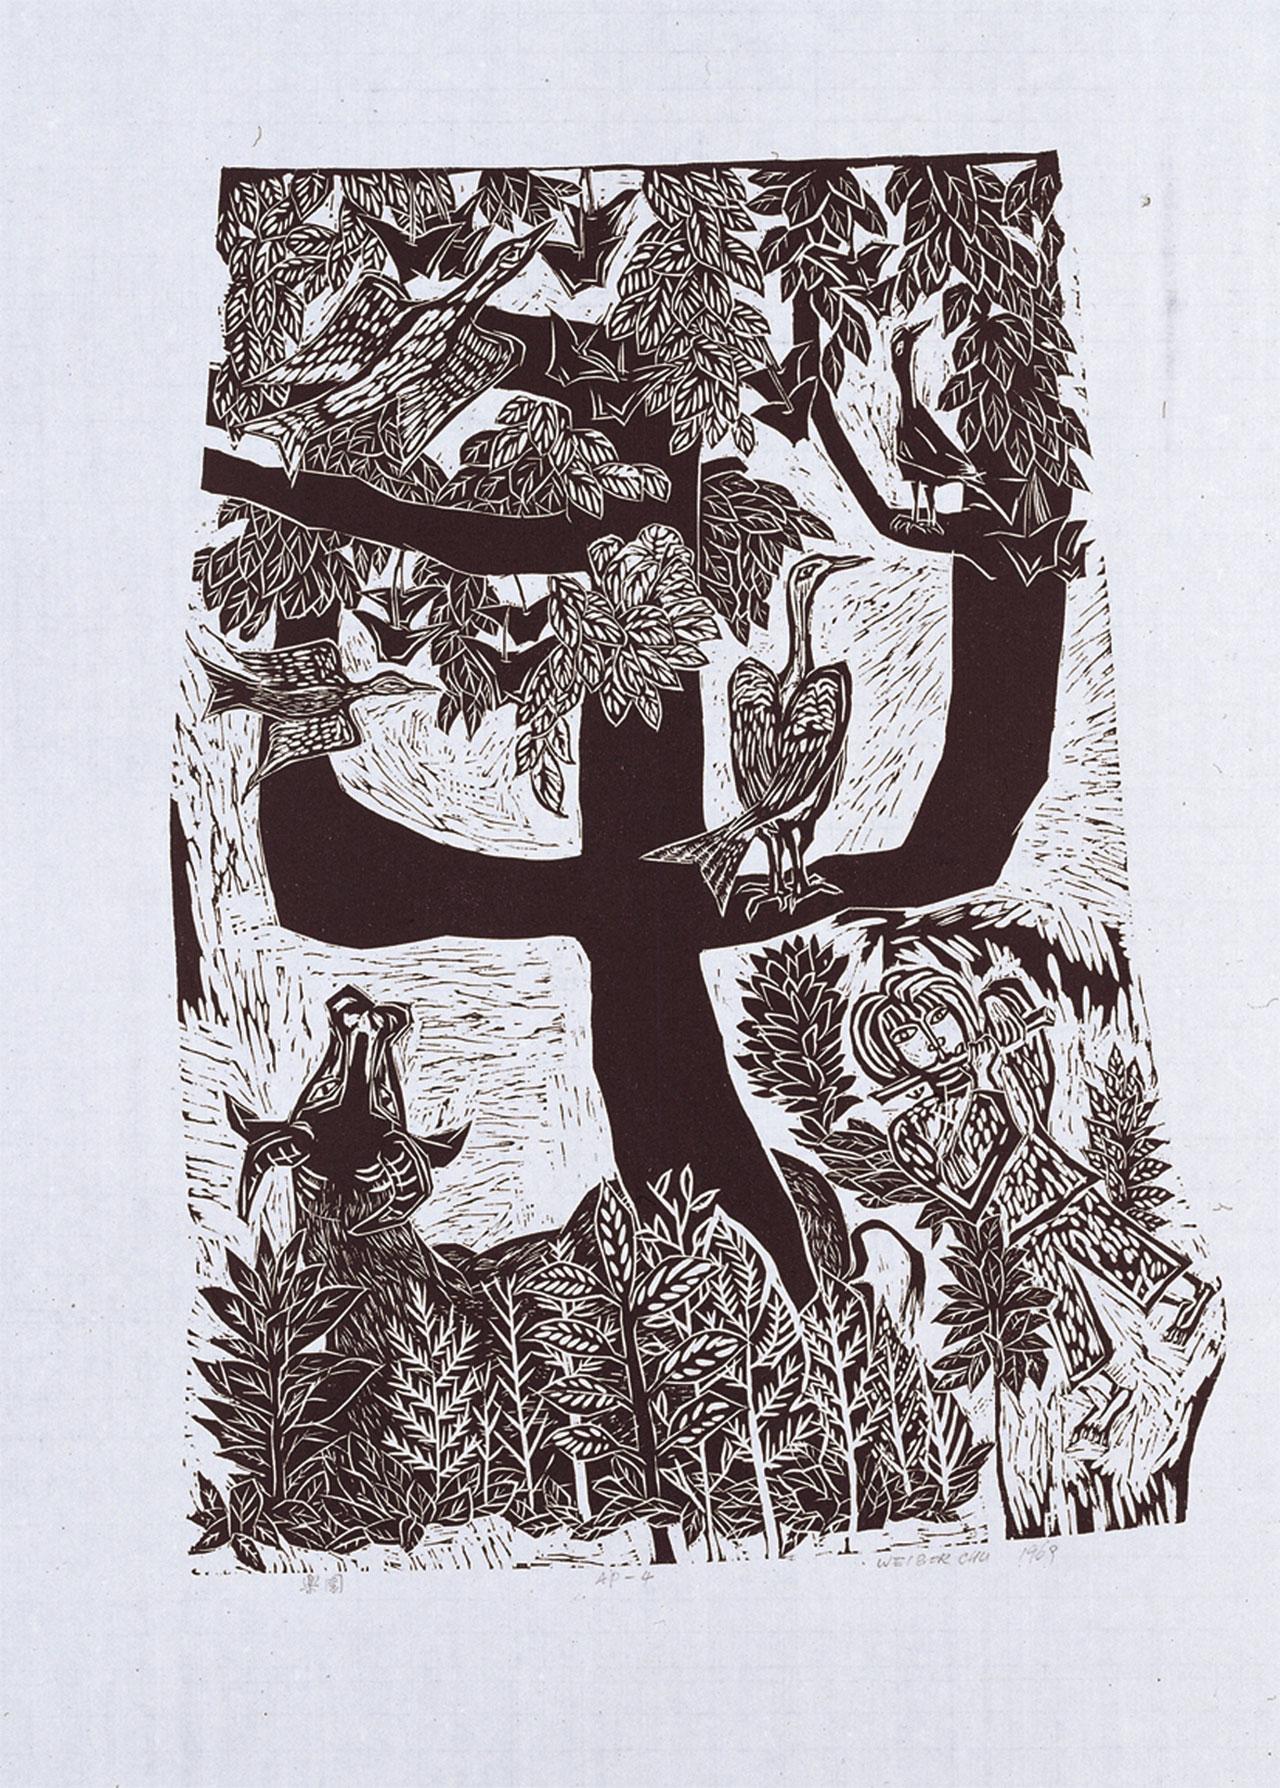 Paradise Woodcut 91x71.5cm